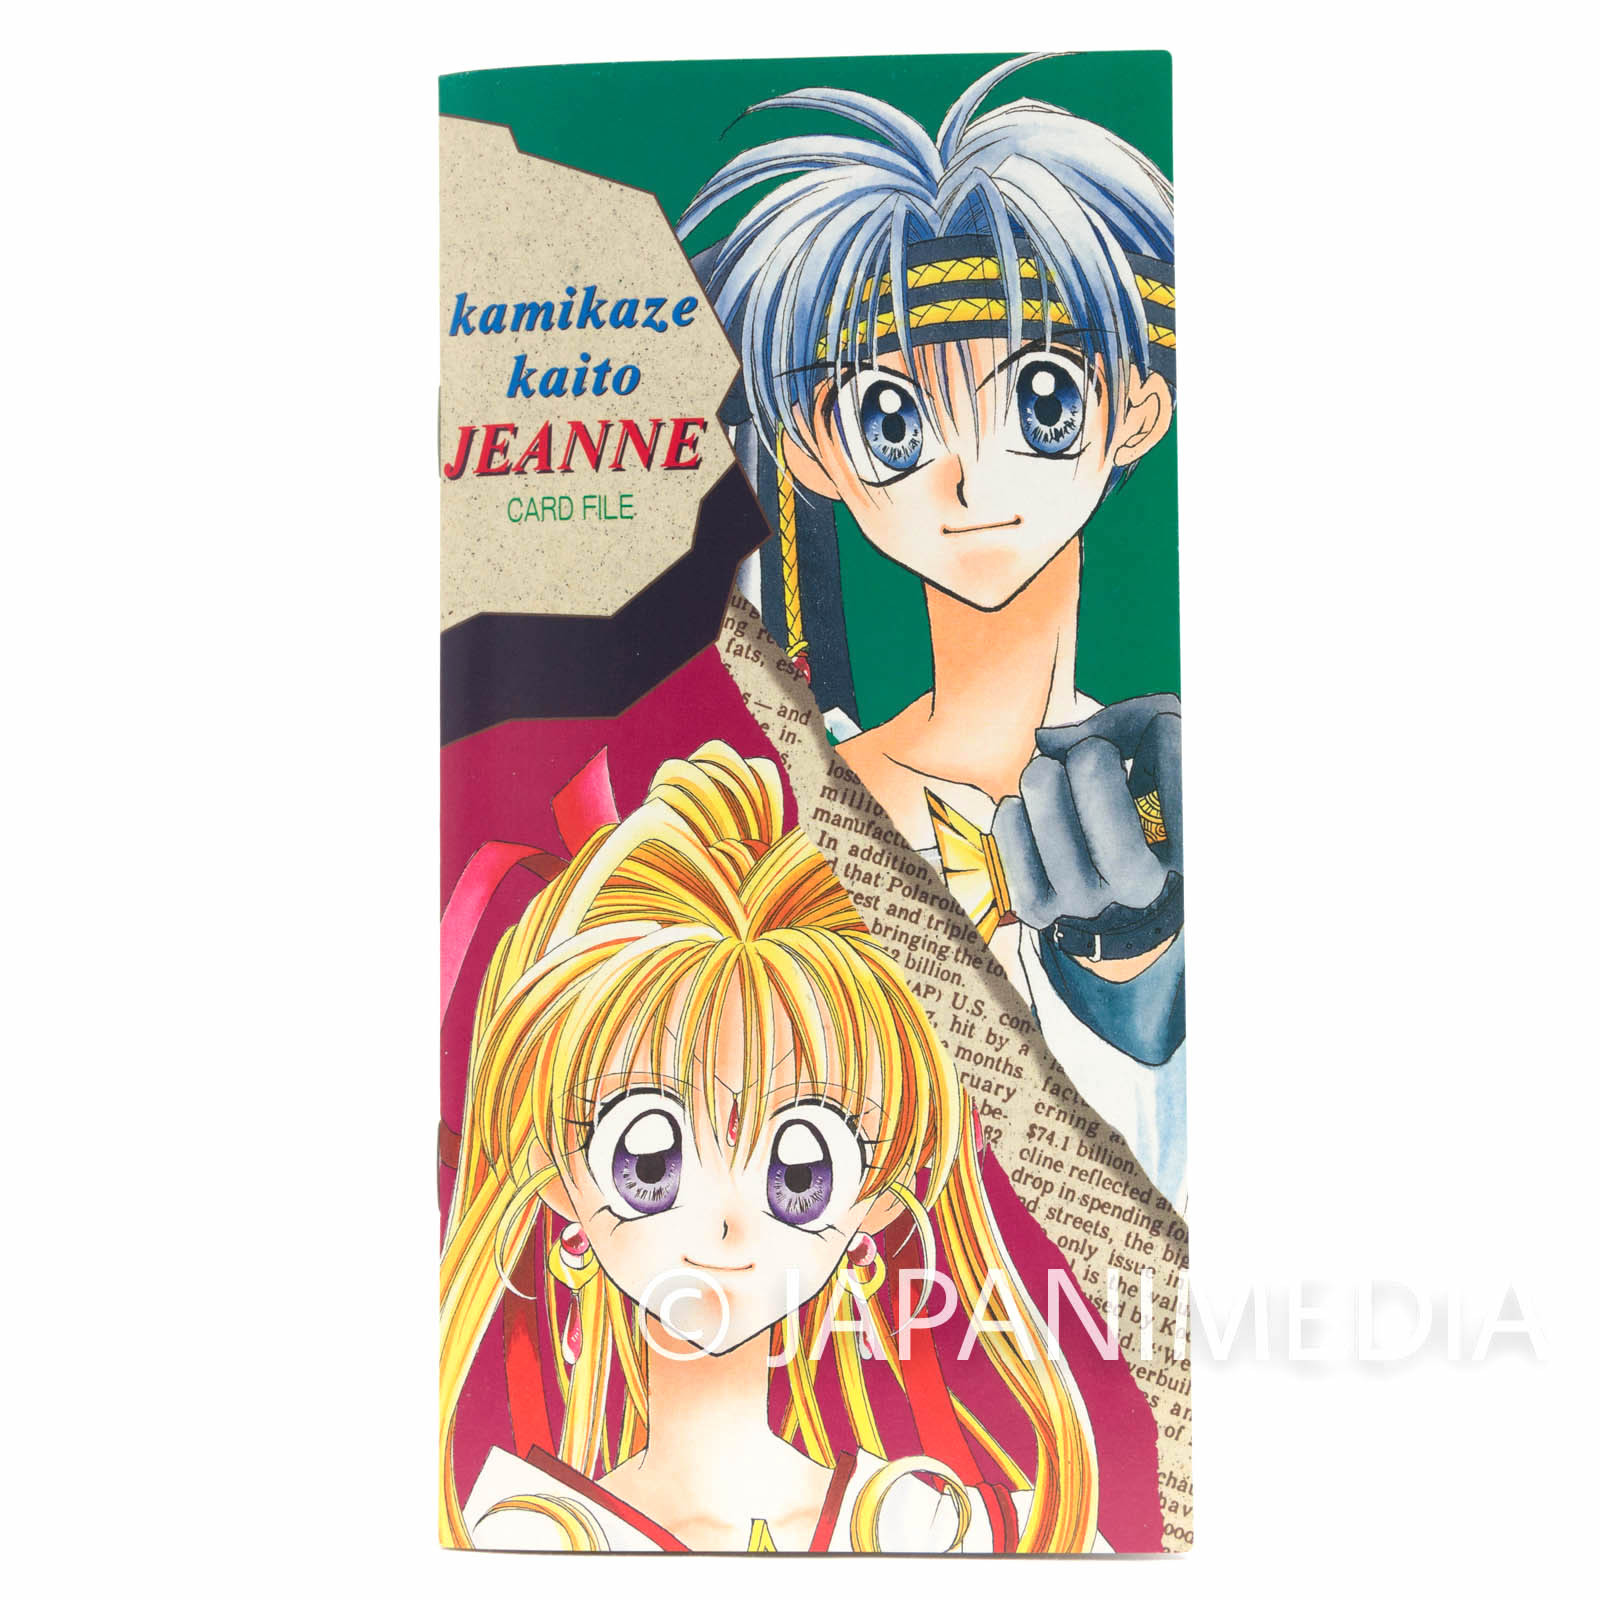 Kamikaze Kaitou Jeanne Card File Ribon JAPAN ANIME